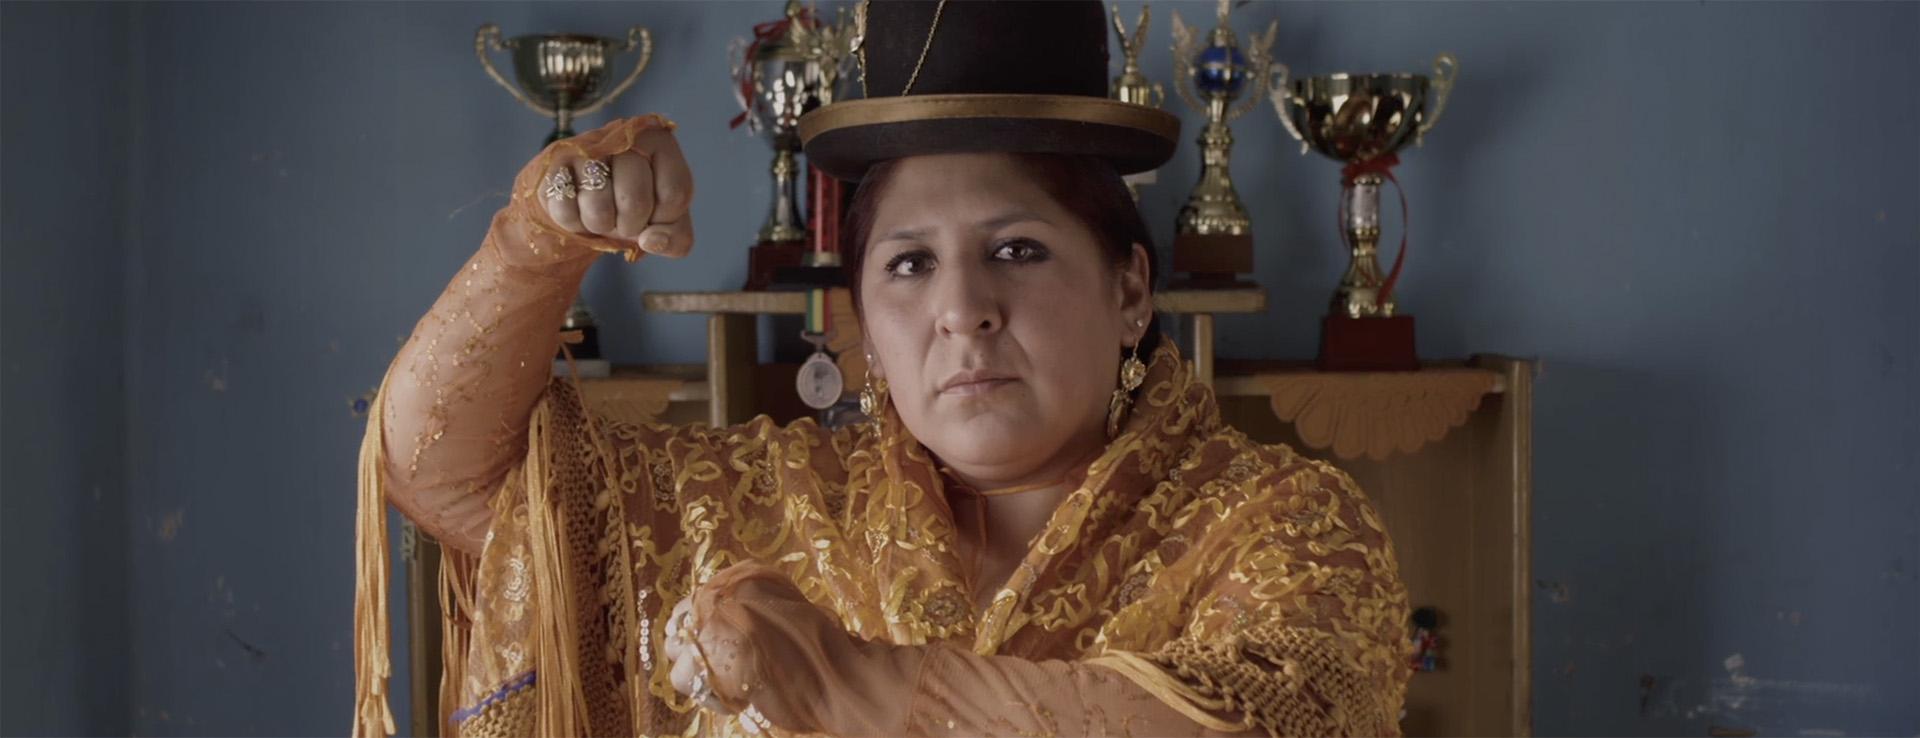 Chin CHin. La Cholita Luchadora – El Ojo de Iberoamerica